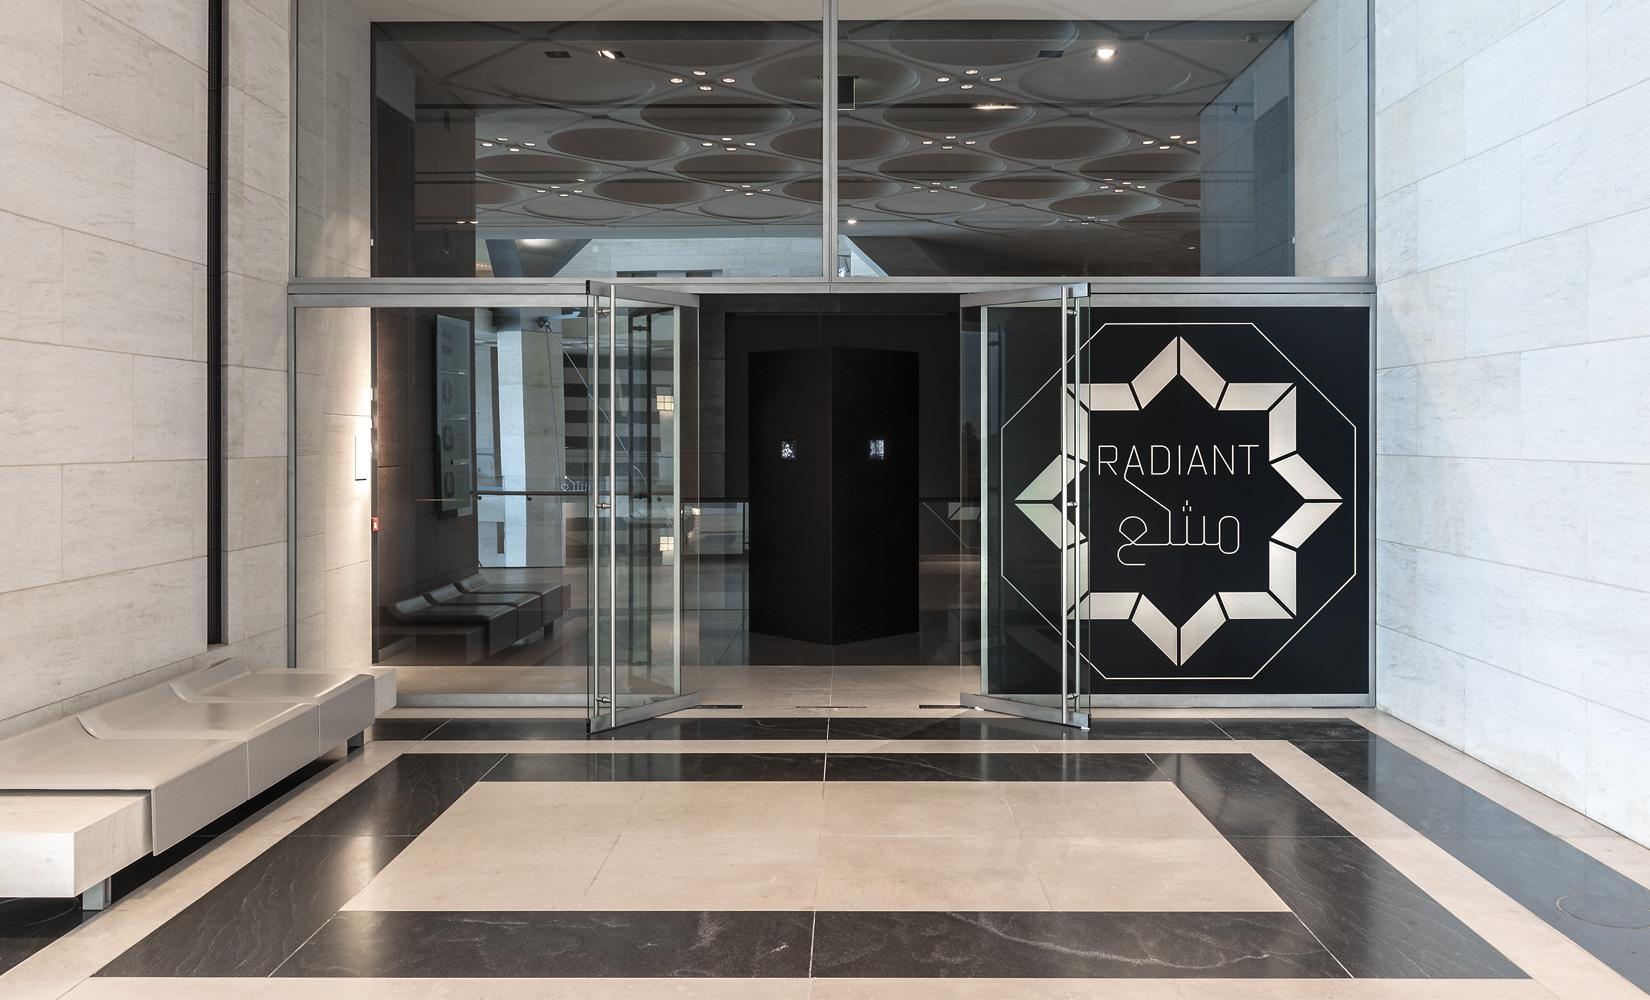 Radiant-expo1.jpg